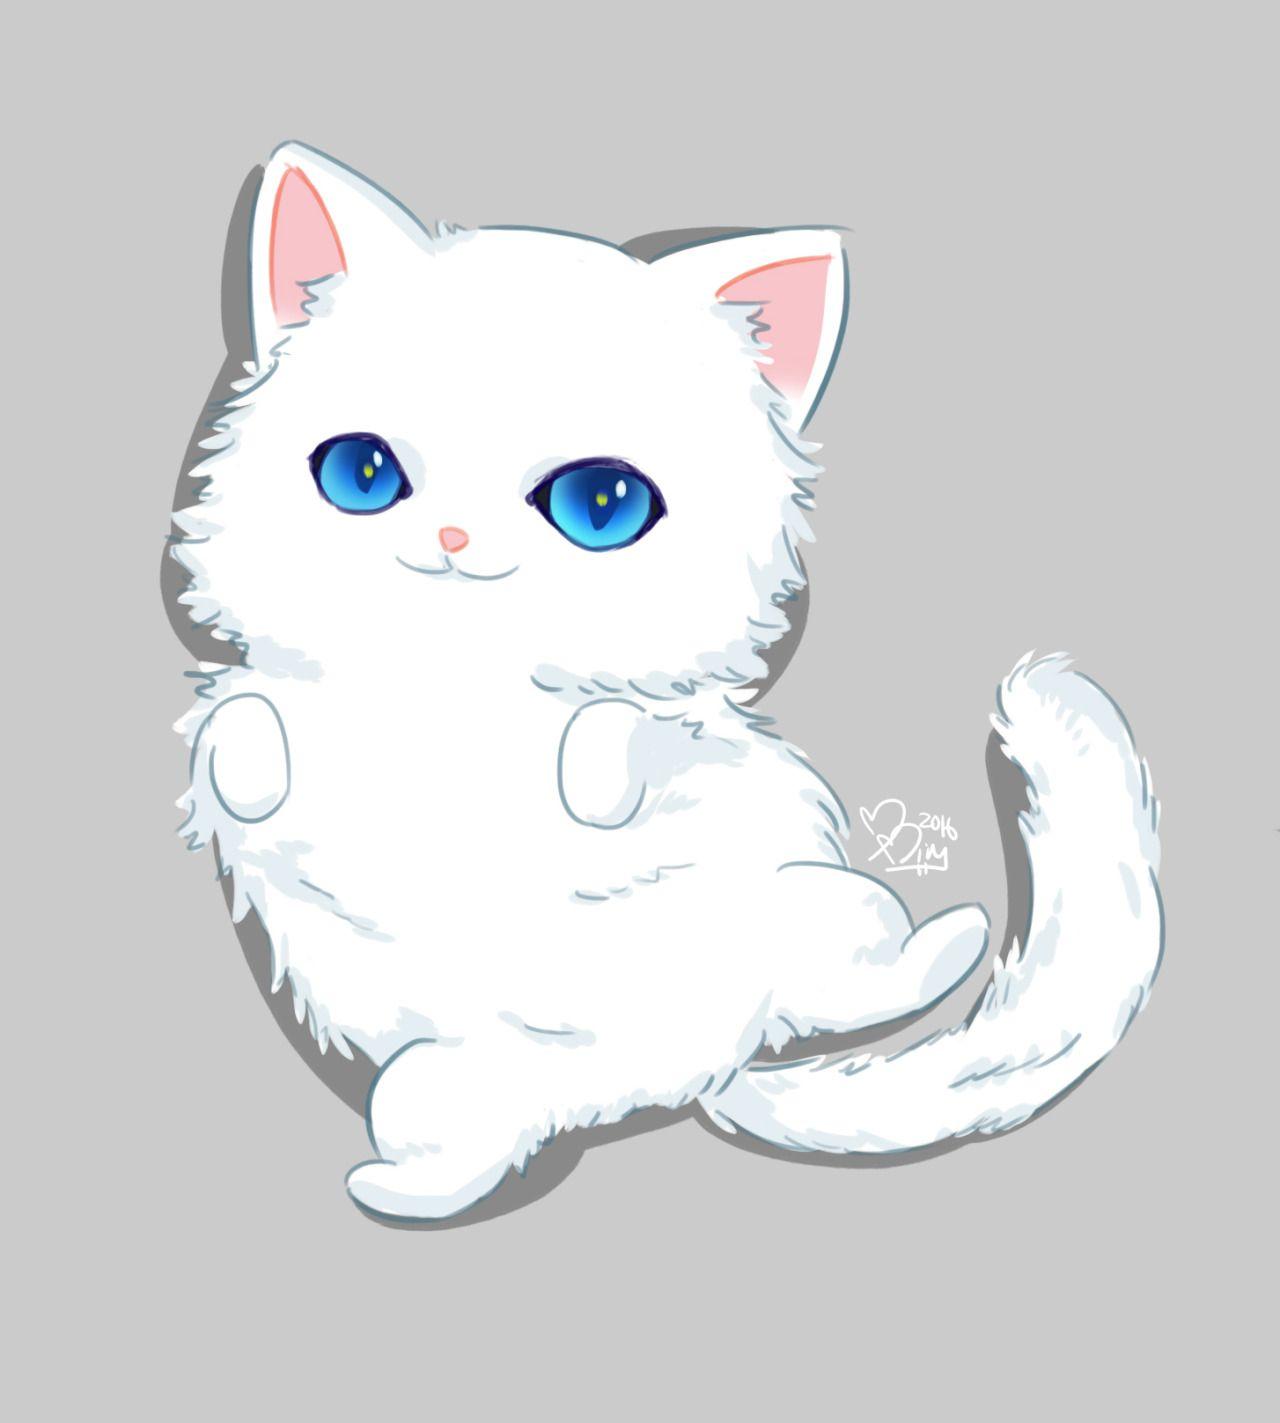 I Love This Mystic Messenger Fanart Anime Cat Persian Cat